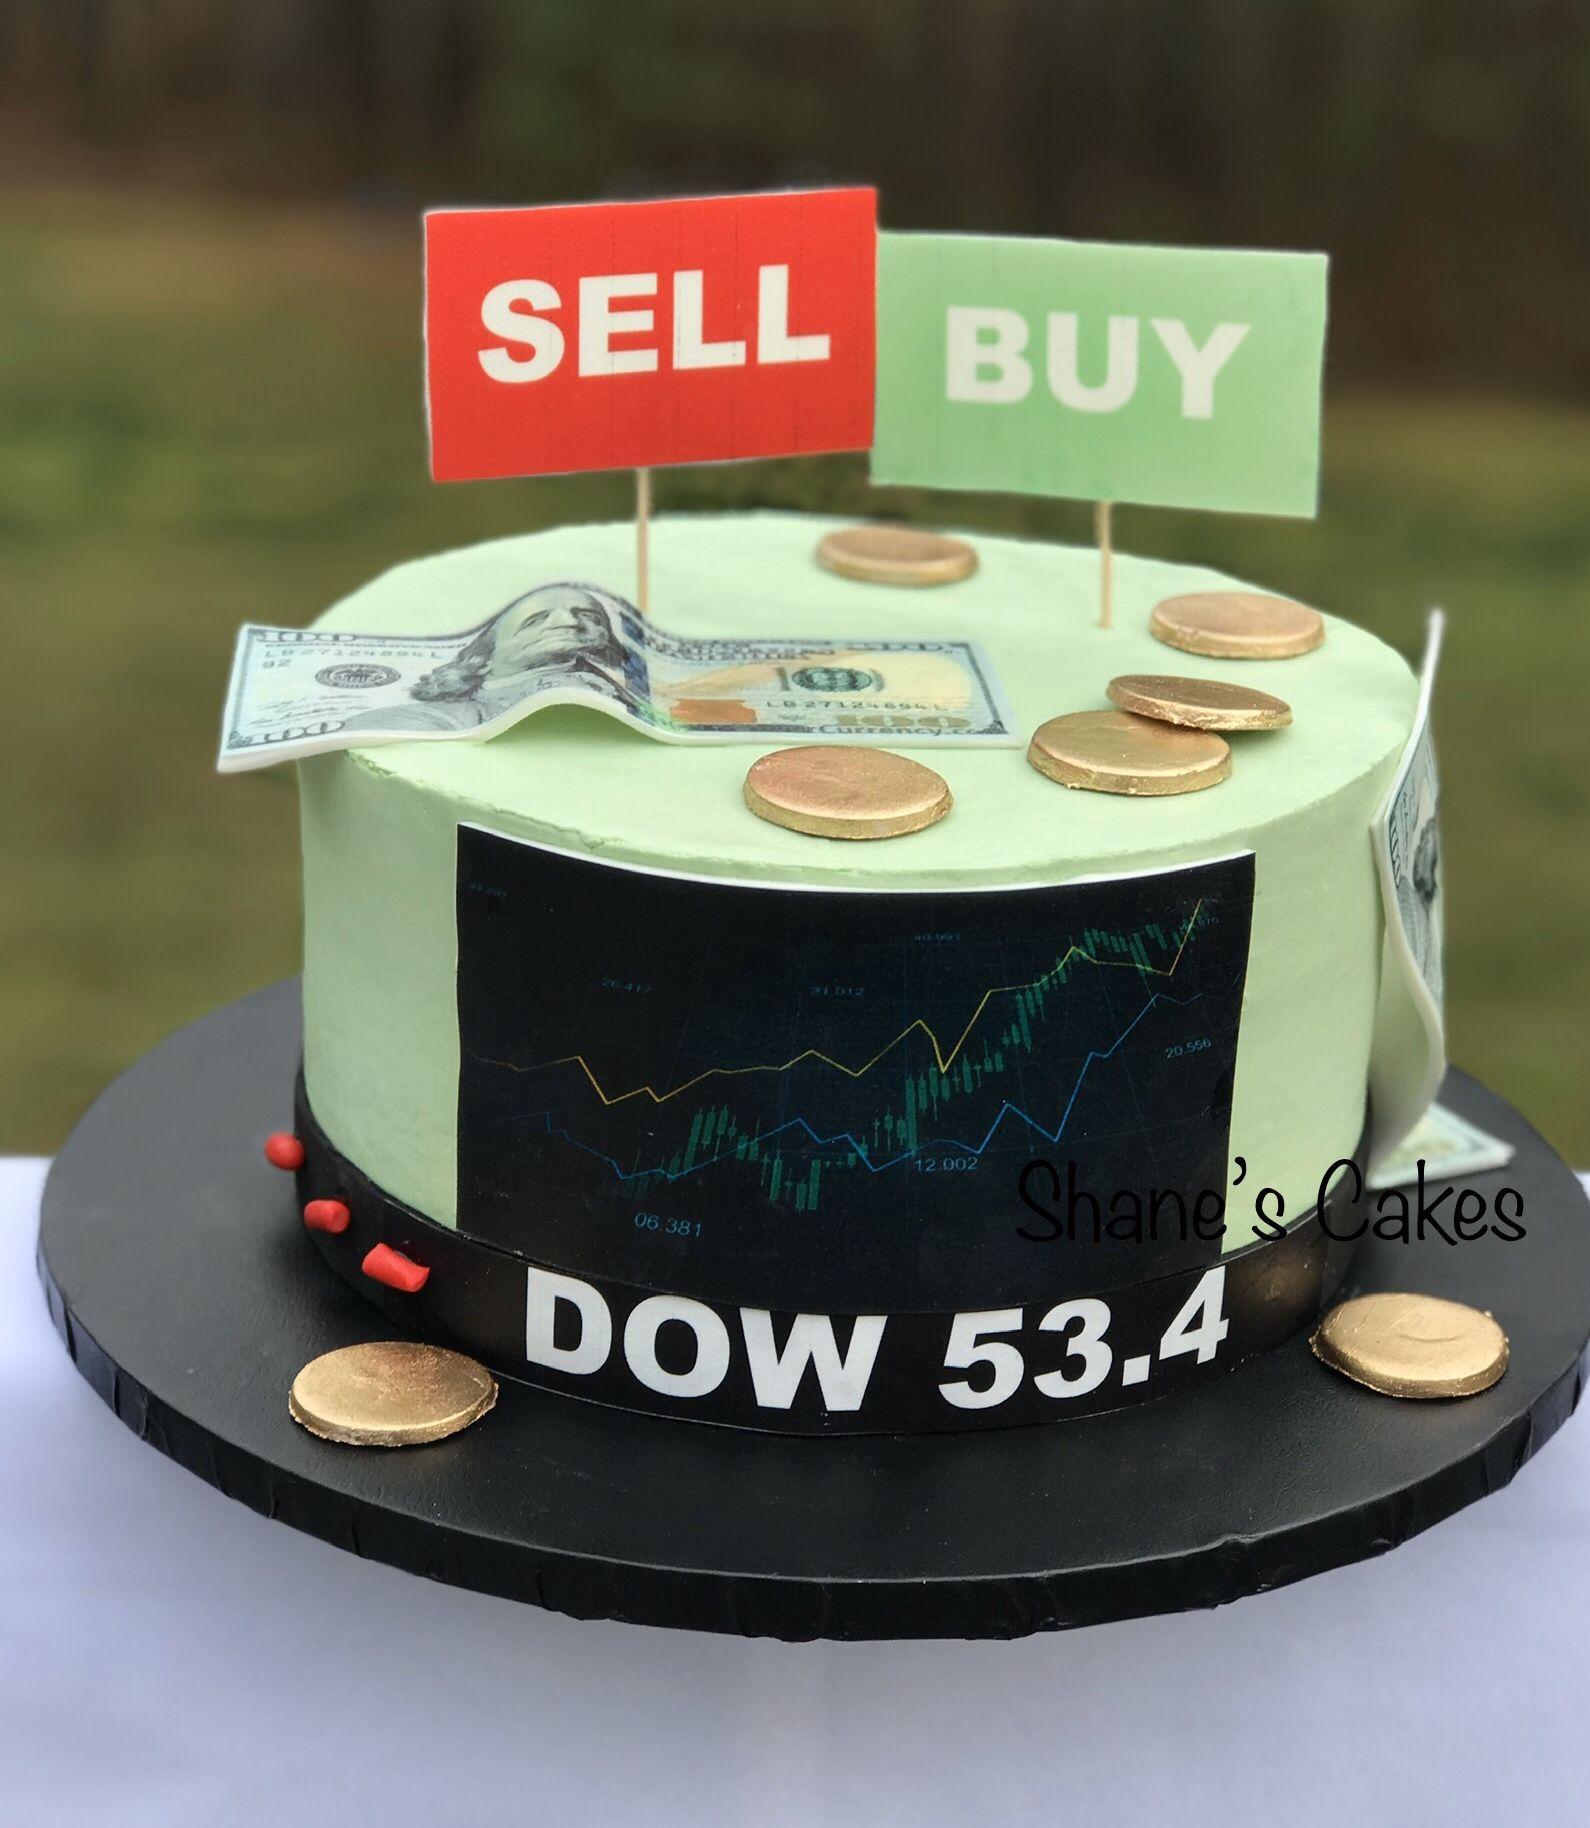 Stock Market Themed Birthday Cake Themed Birthday Cakes Cake Stock Money Birthday Cake